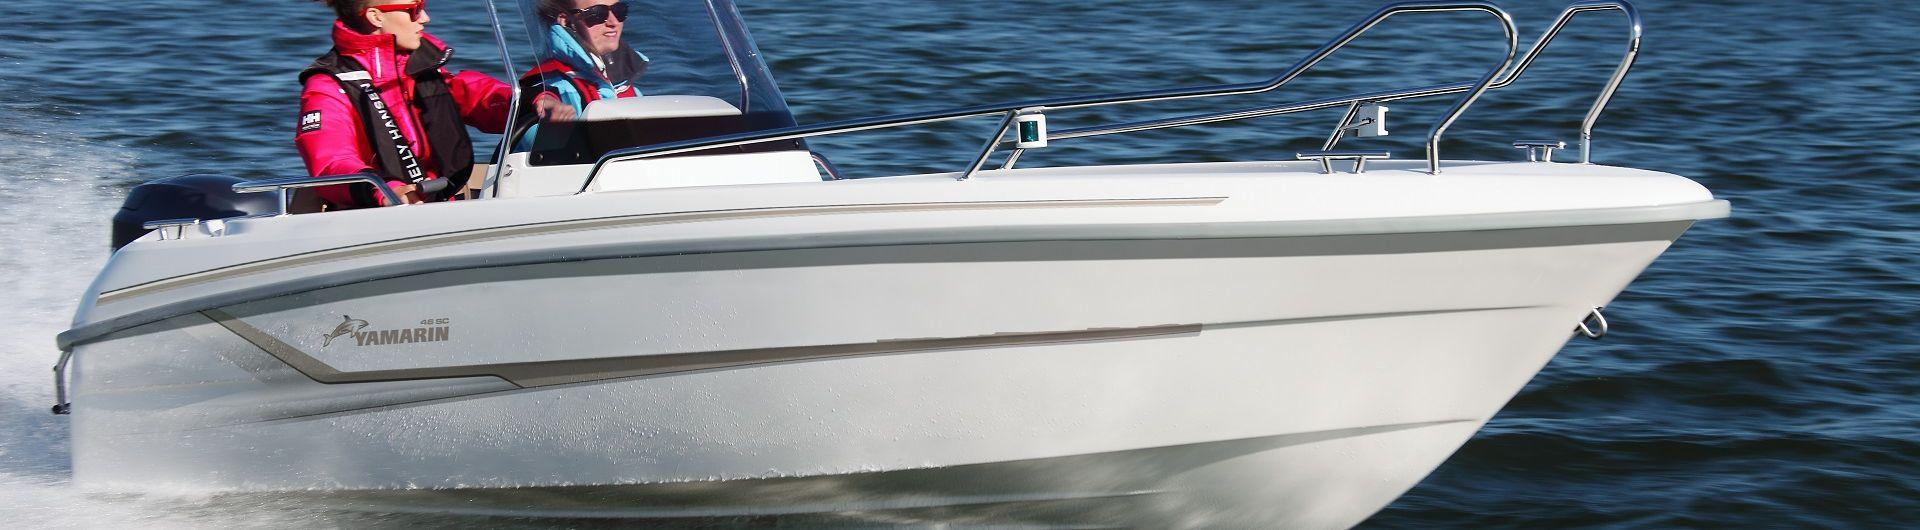 Sportboot Yamarin 46 SC 1